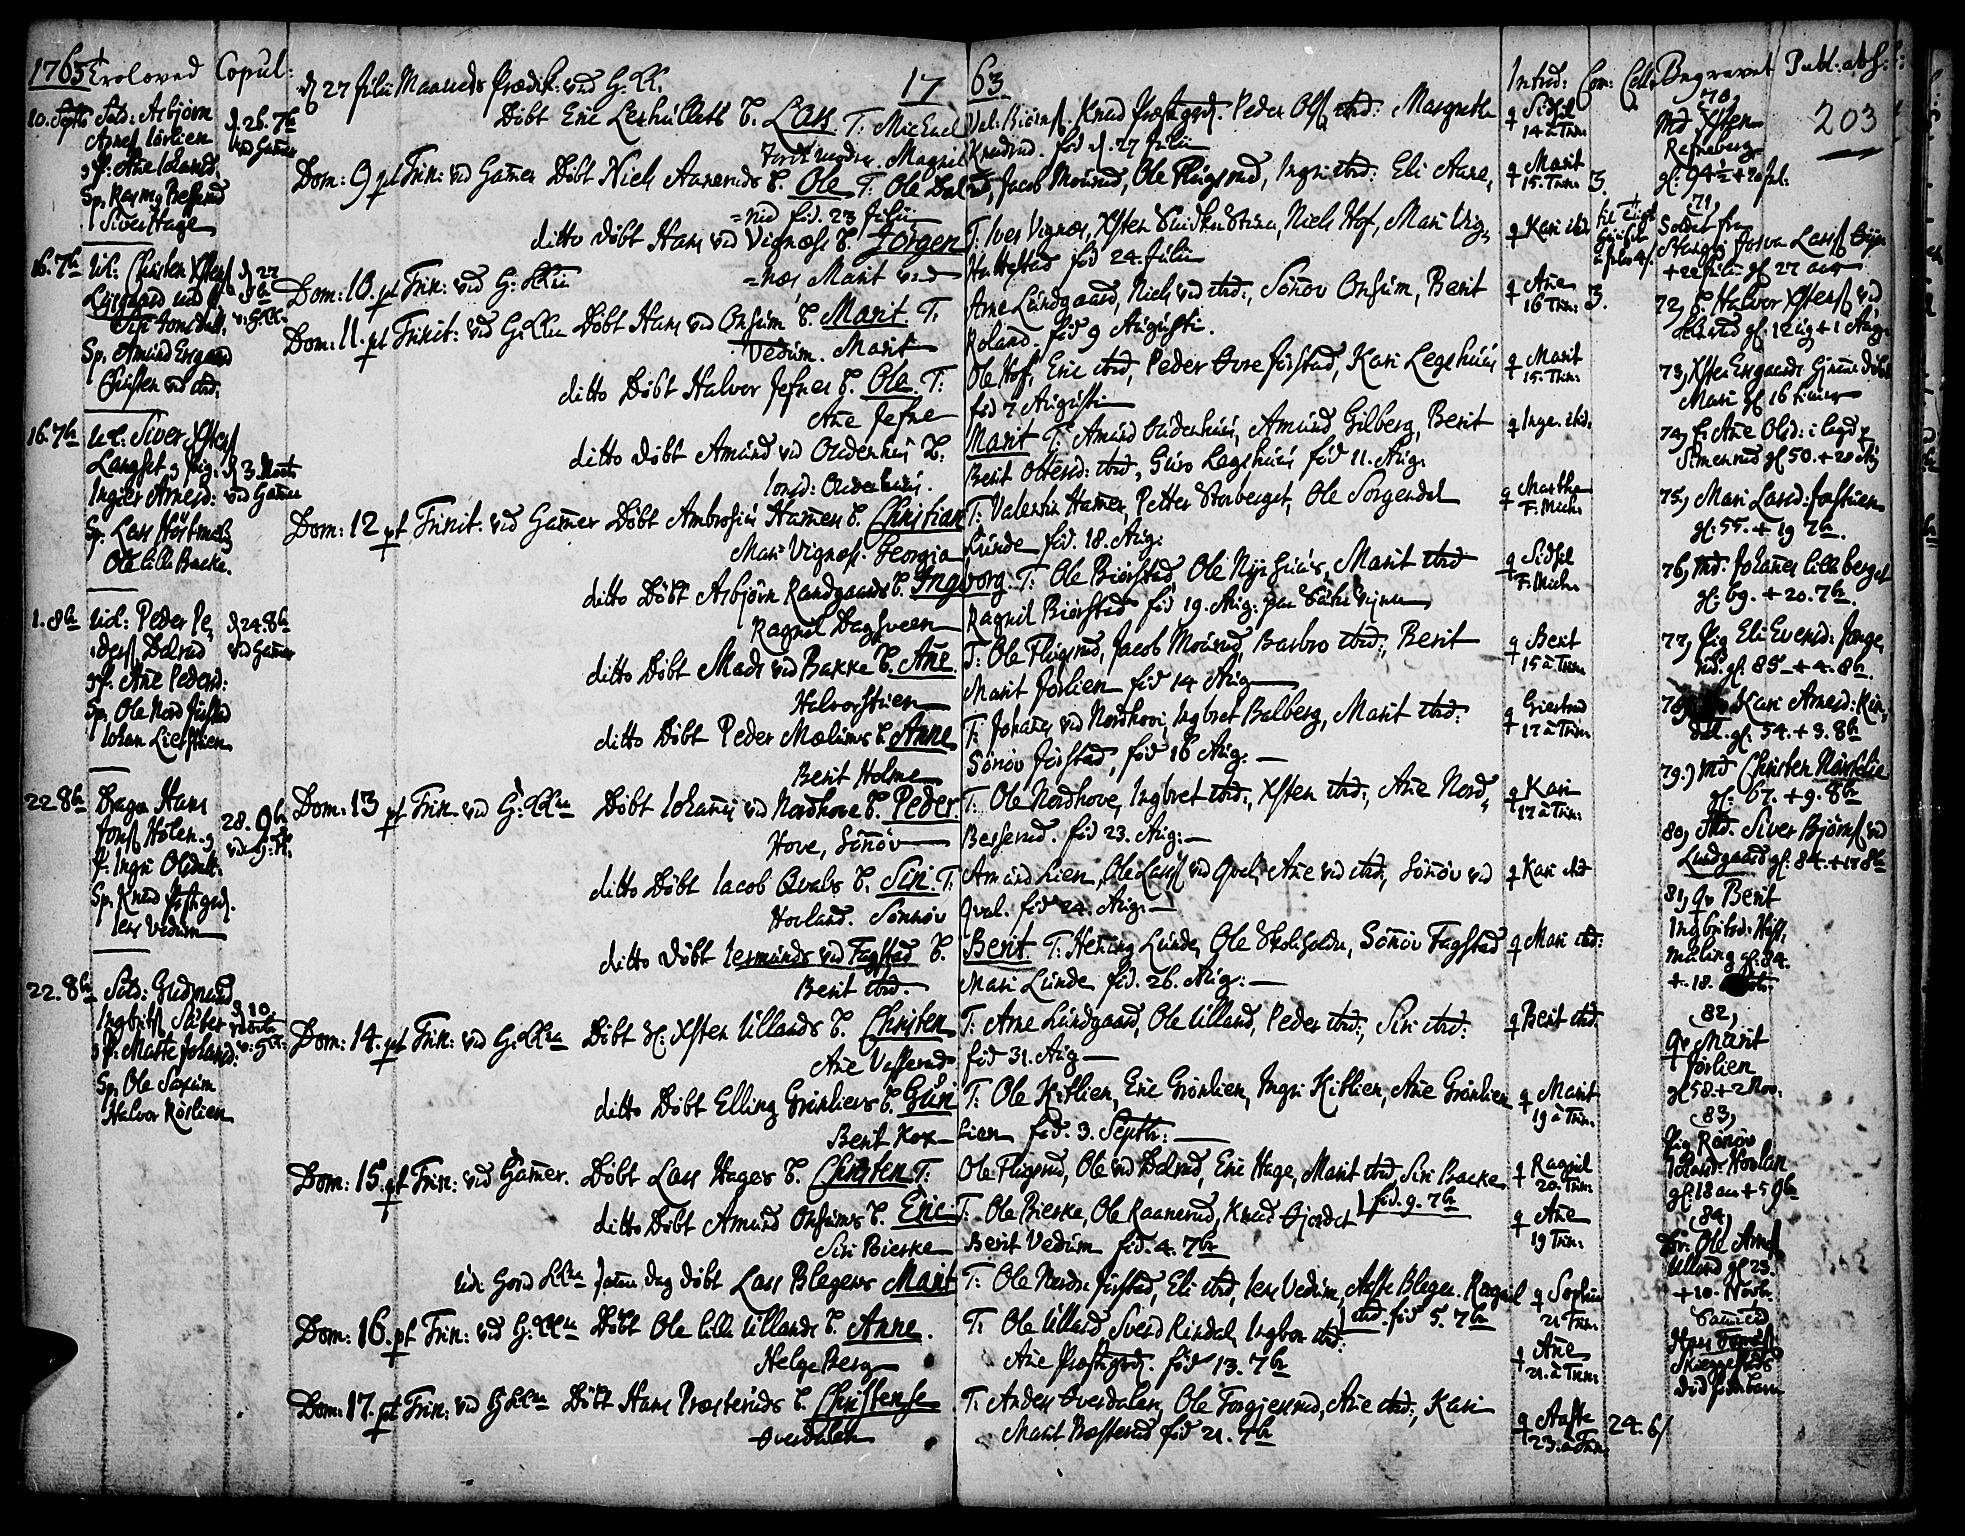 SAH, Fåberg prestekontor, H/Ha/Haa/L0001: Ministerialbok nr. 1, 1727-1775, s. 203